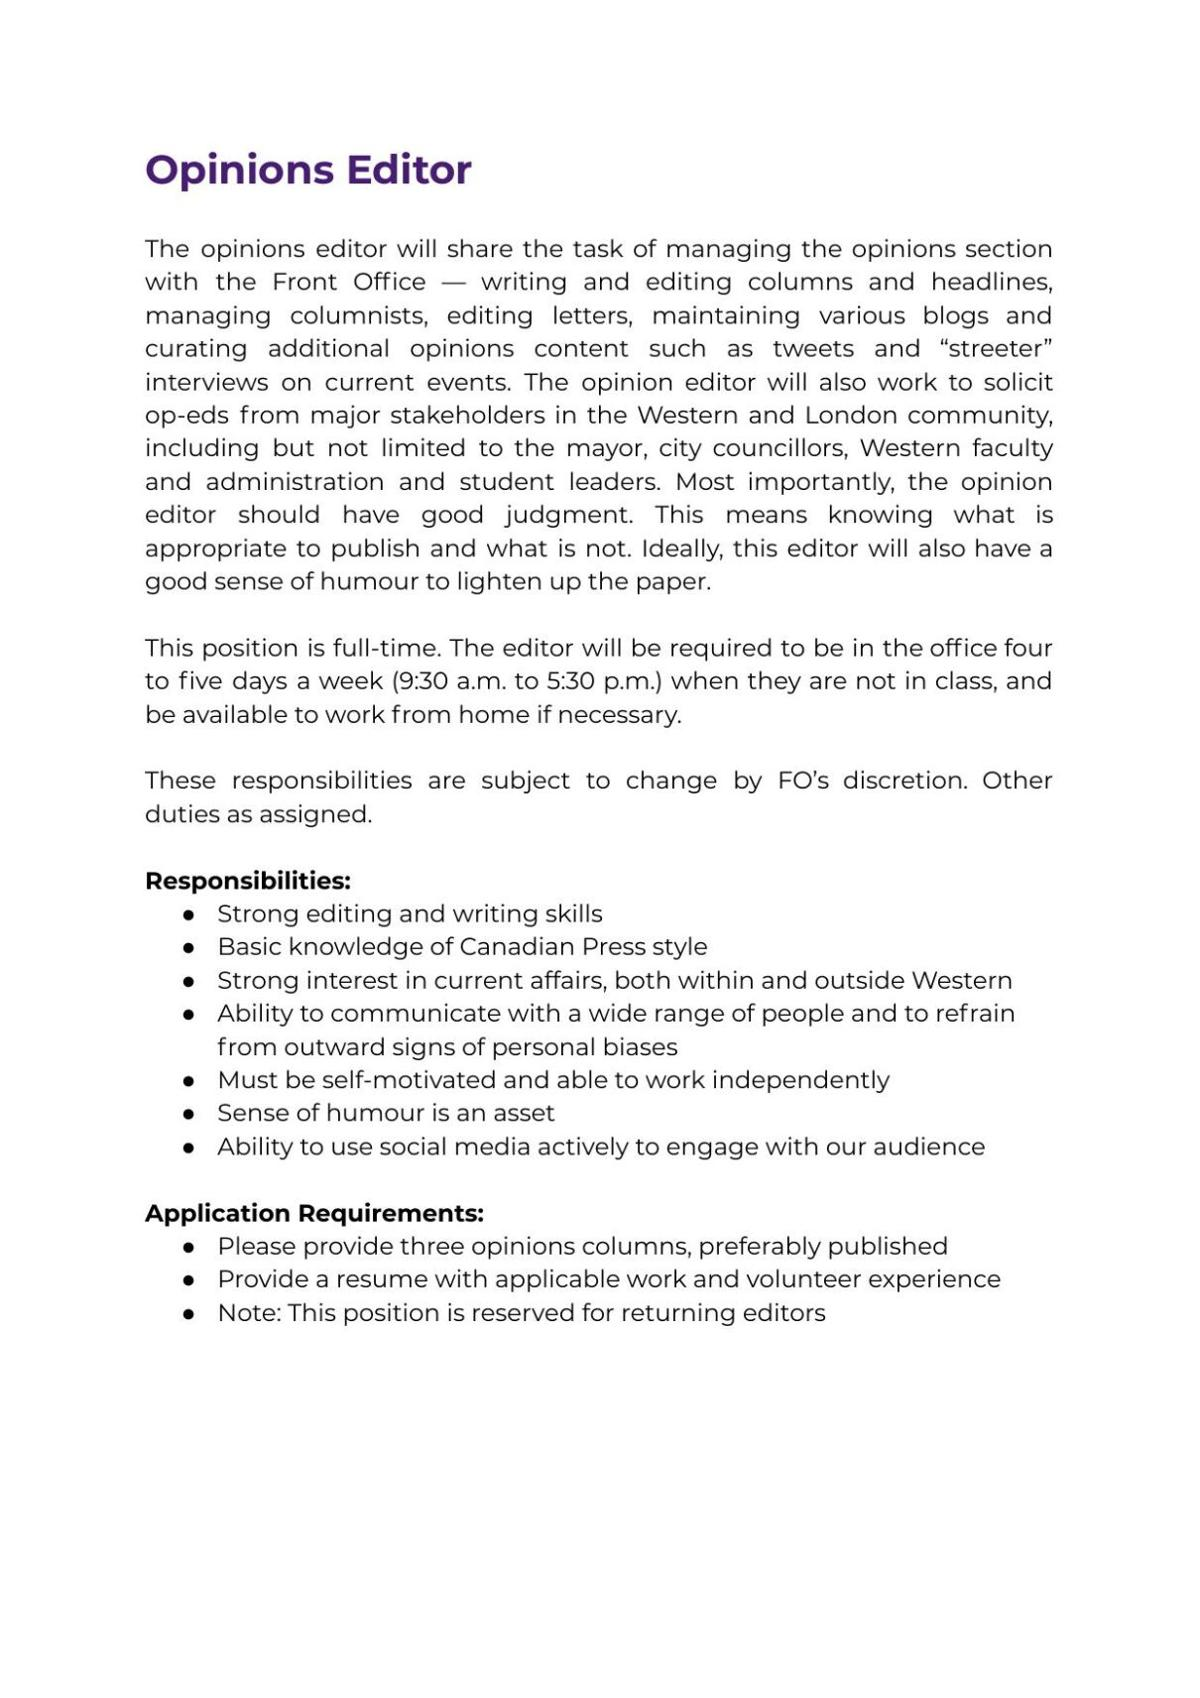 Opinions Editor Job Description 2021